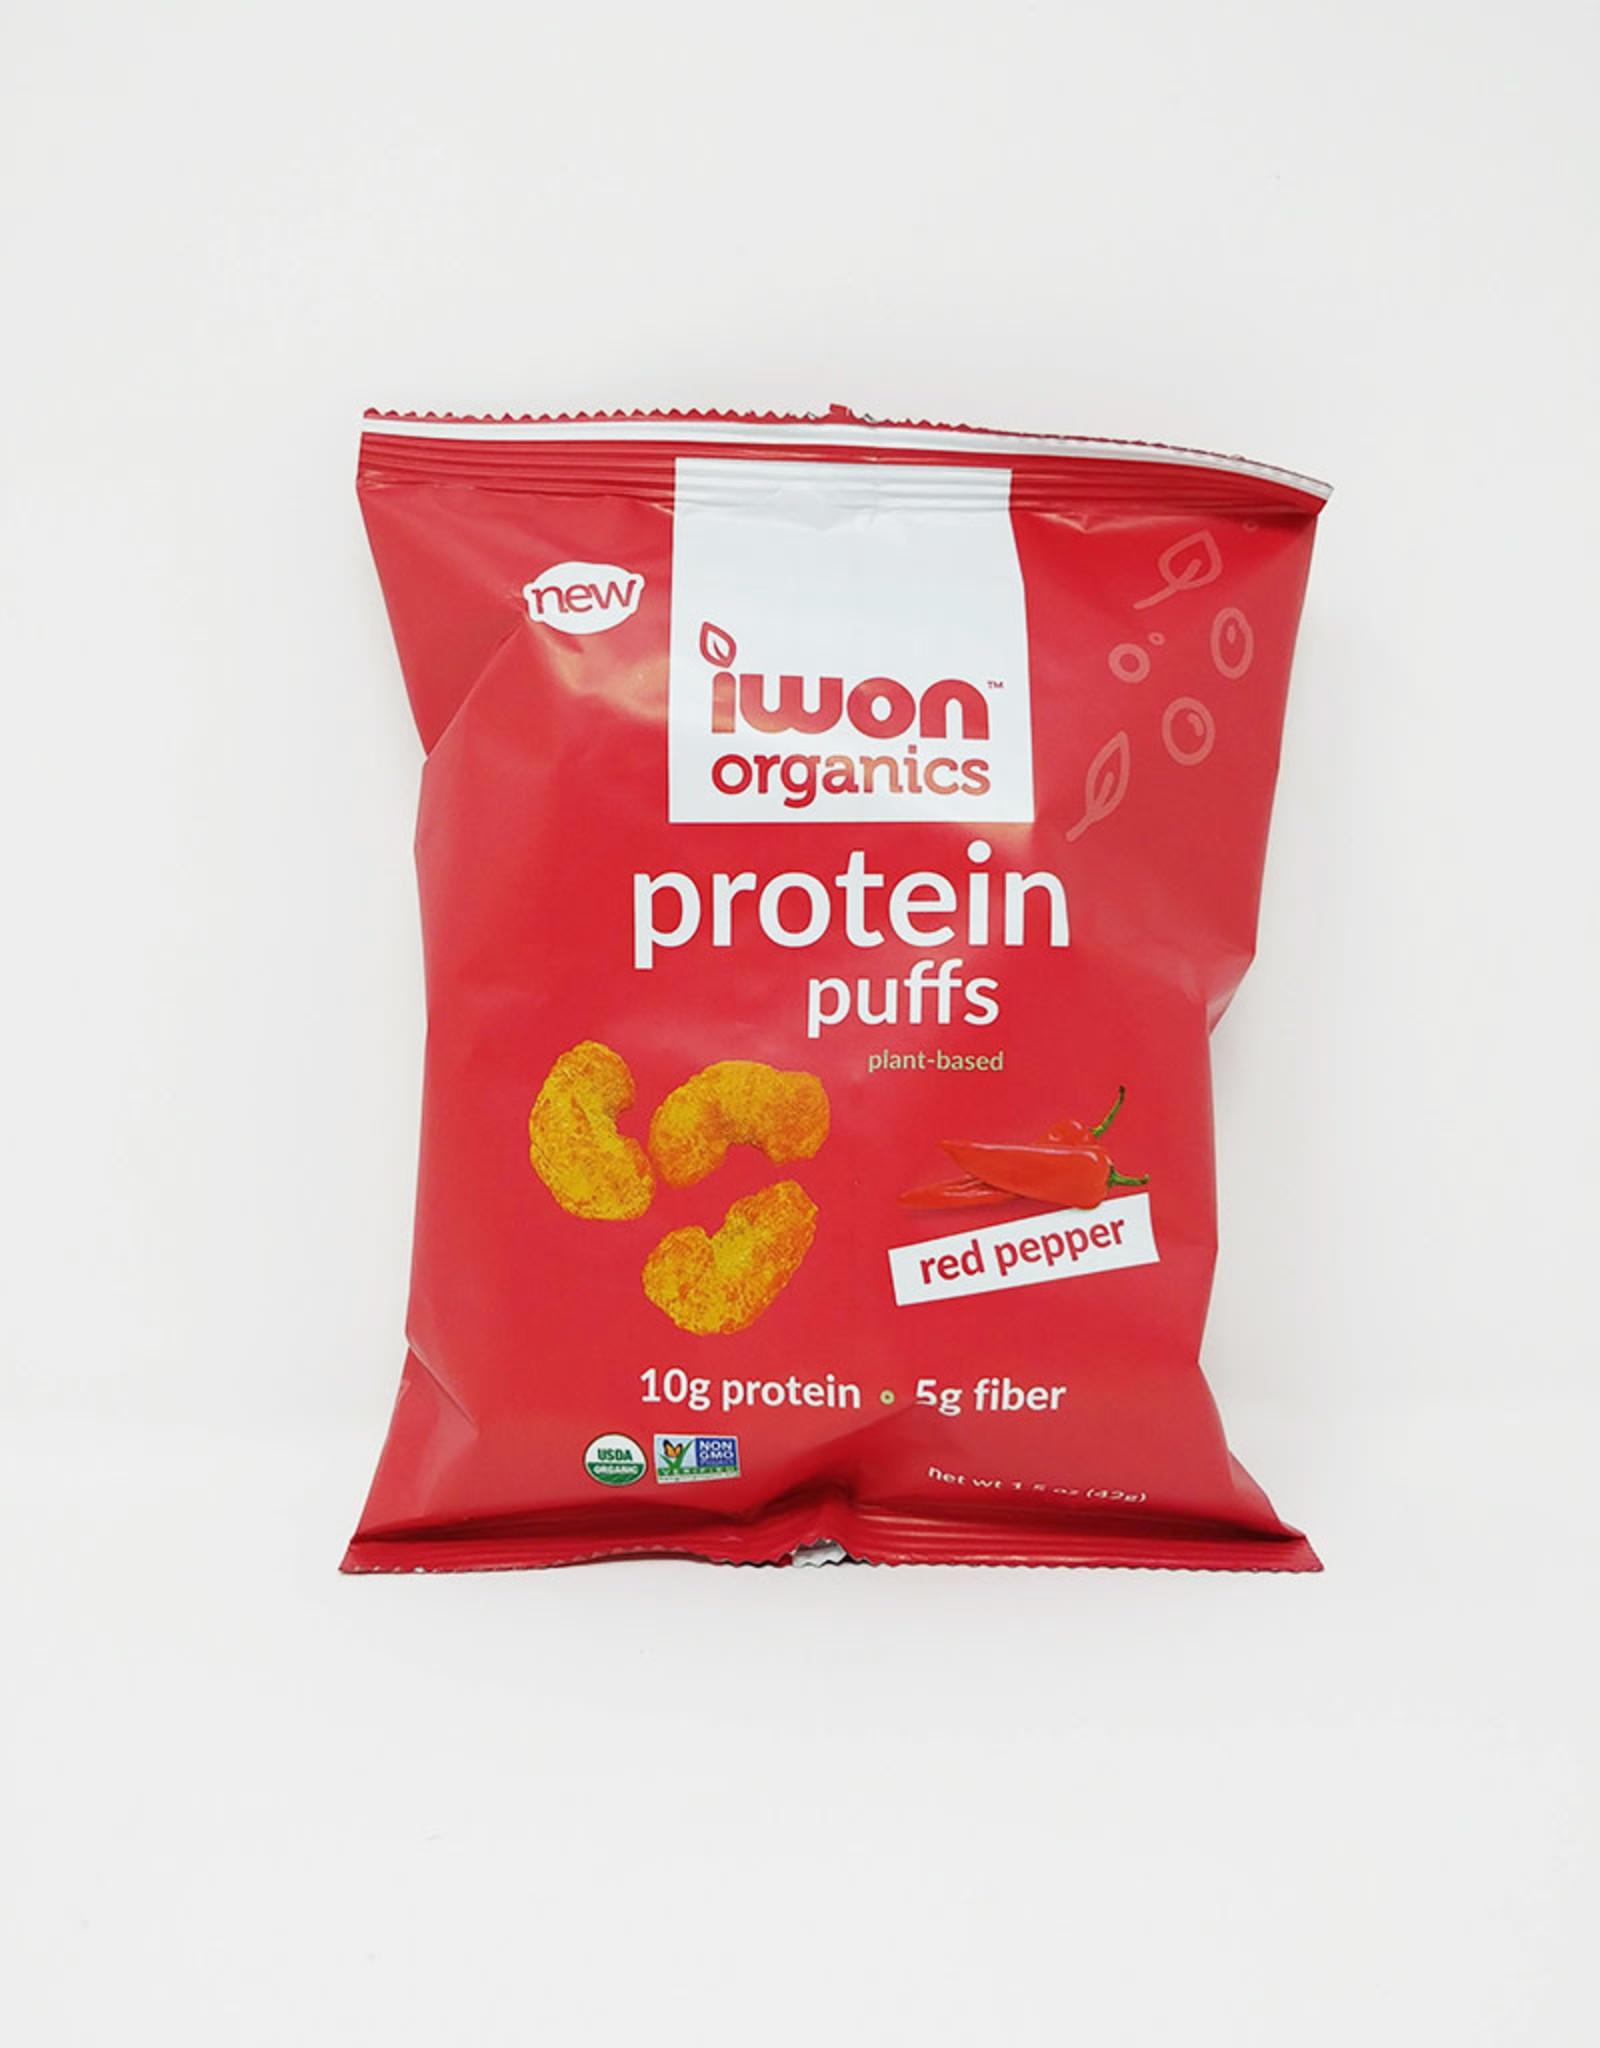 Iwon Organics Iwon Organics - Protein Puffs, Red Peppers (42g)